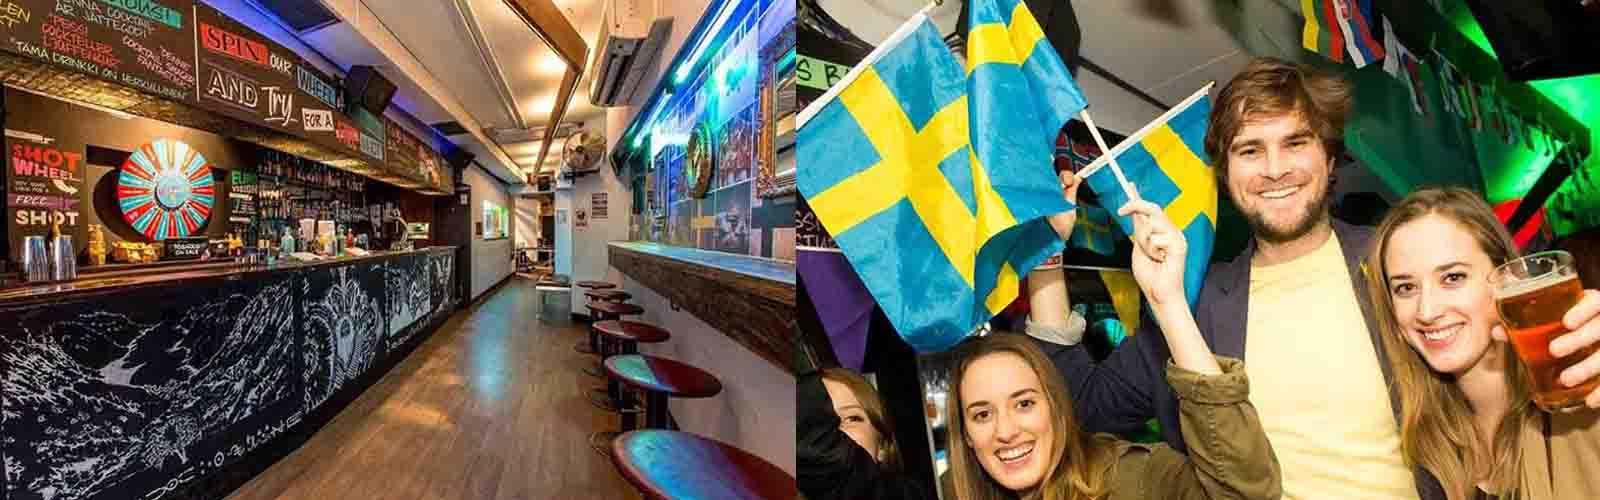 Enjoy wild decor at the Nordic Bar.